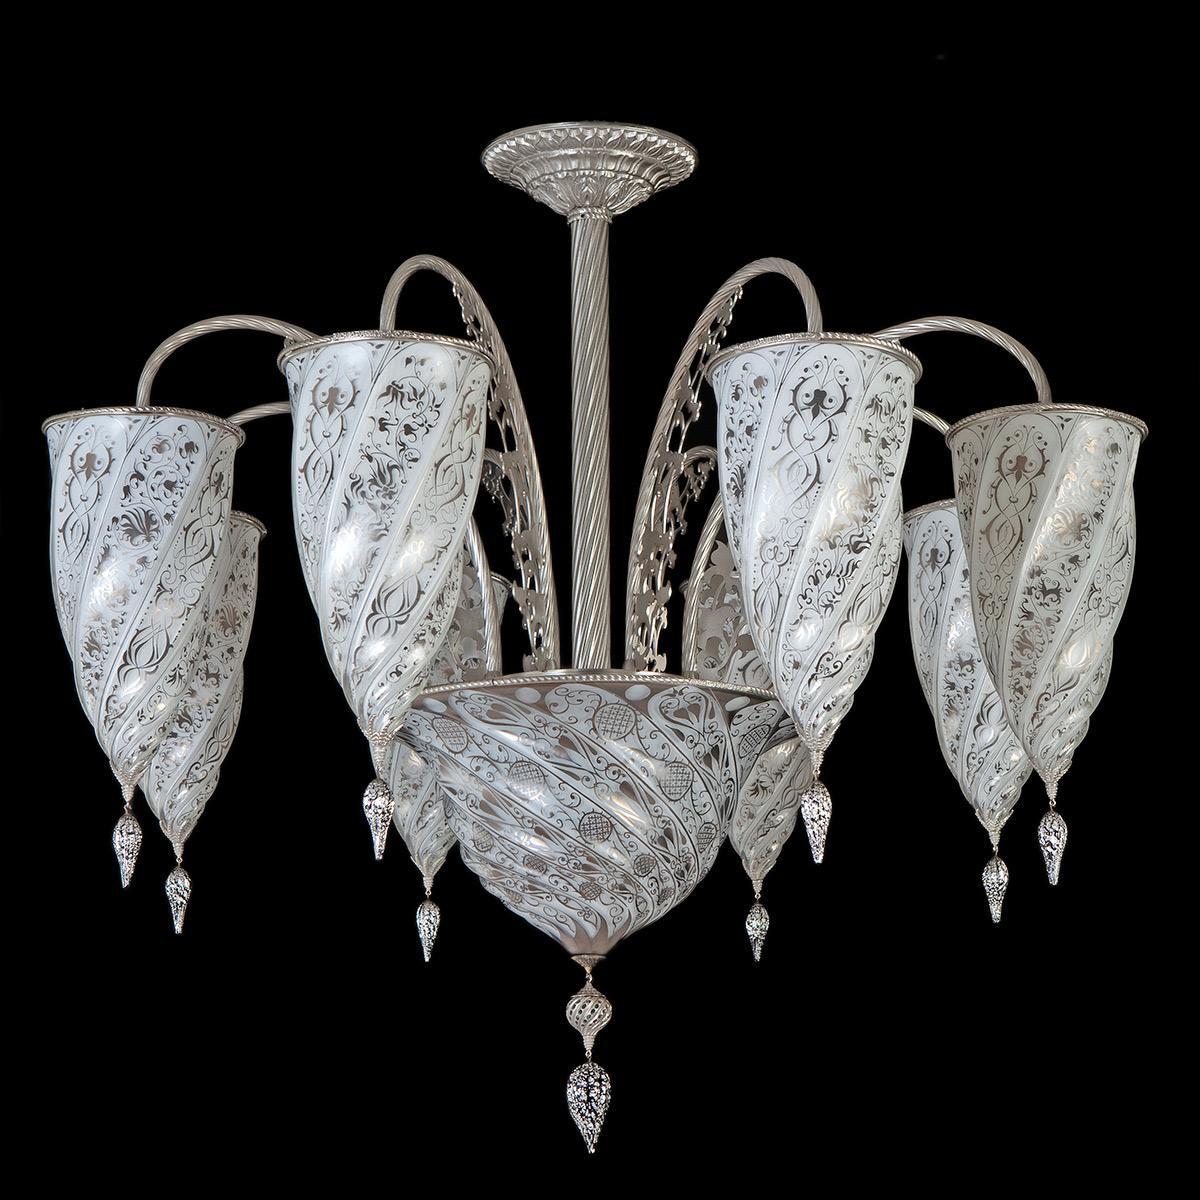 """Jibla"" Murano glass chandelier - 9 lights - white"